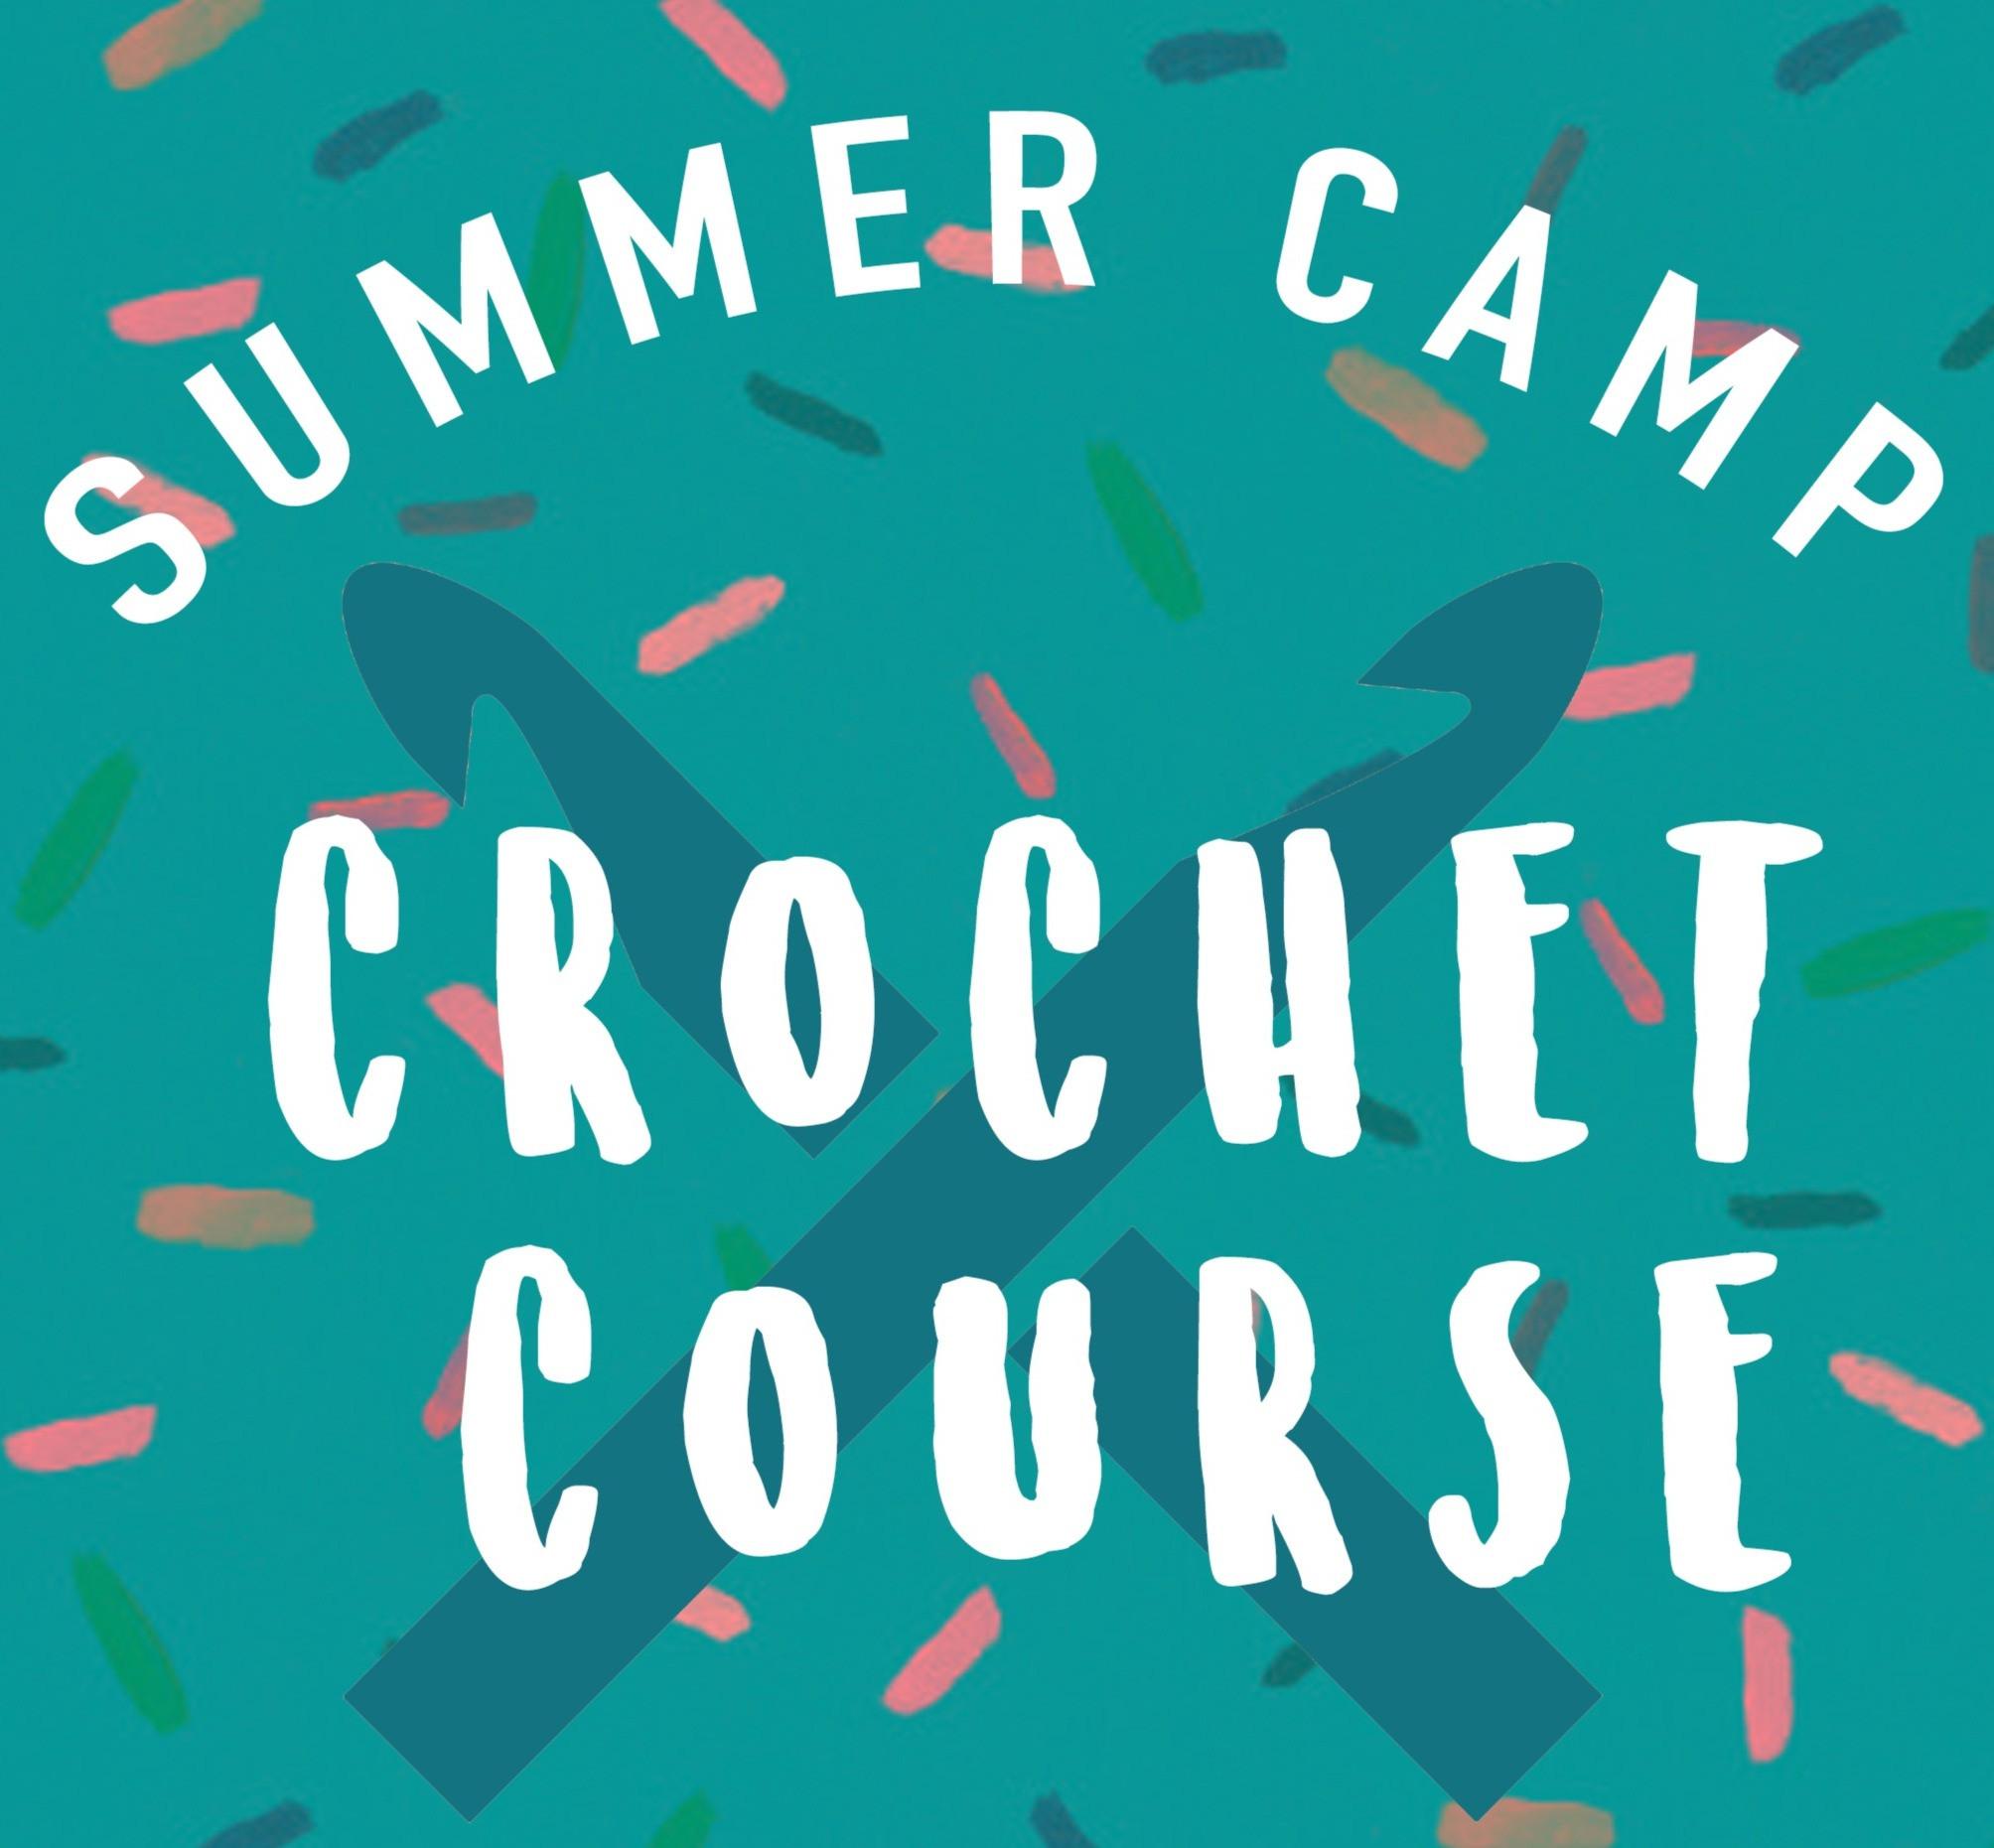 Crochet Summer Course for kids 8+yrs